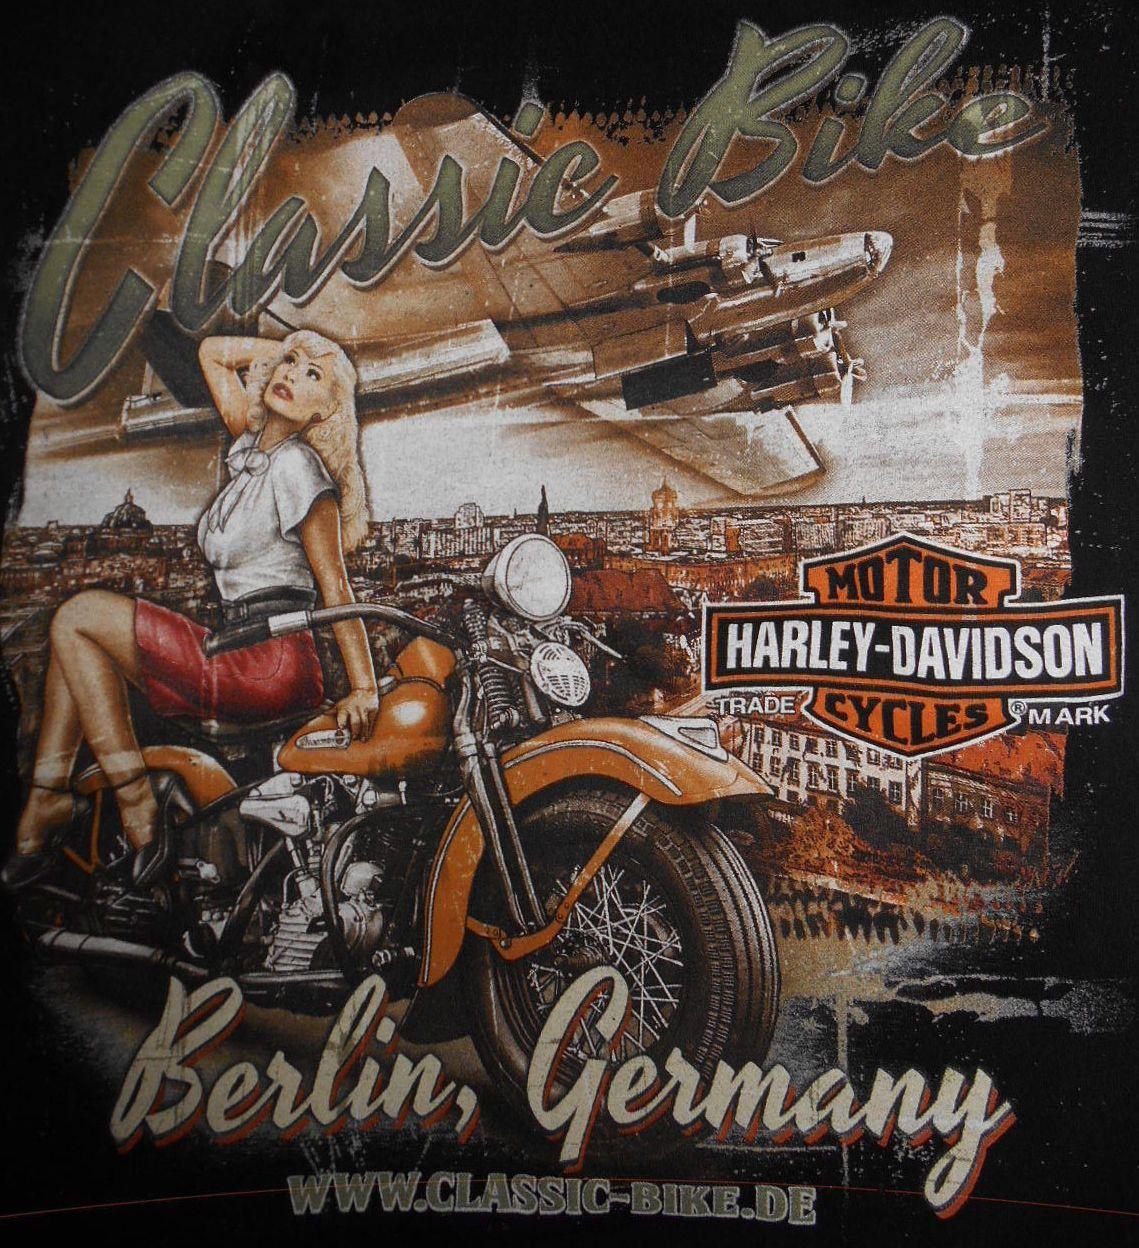 Berlin German Hd Harley Davidson Artwork Harley Davidson Merchandise Harley Davidson Art